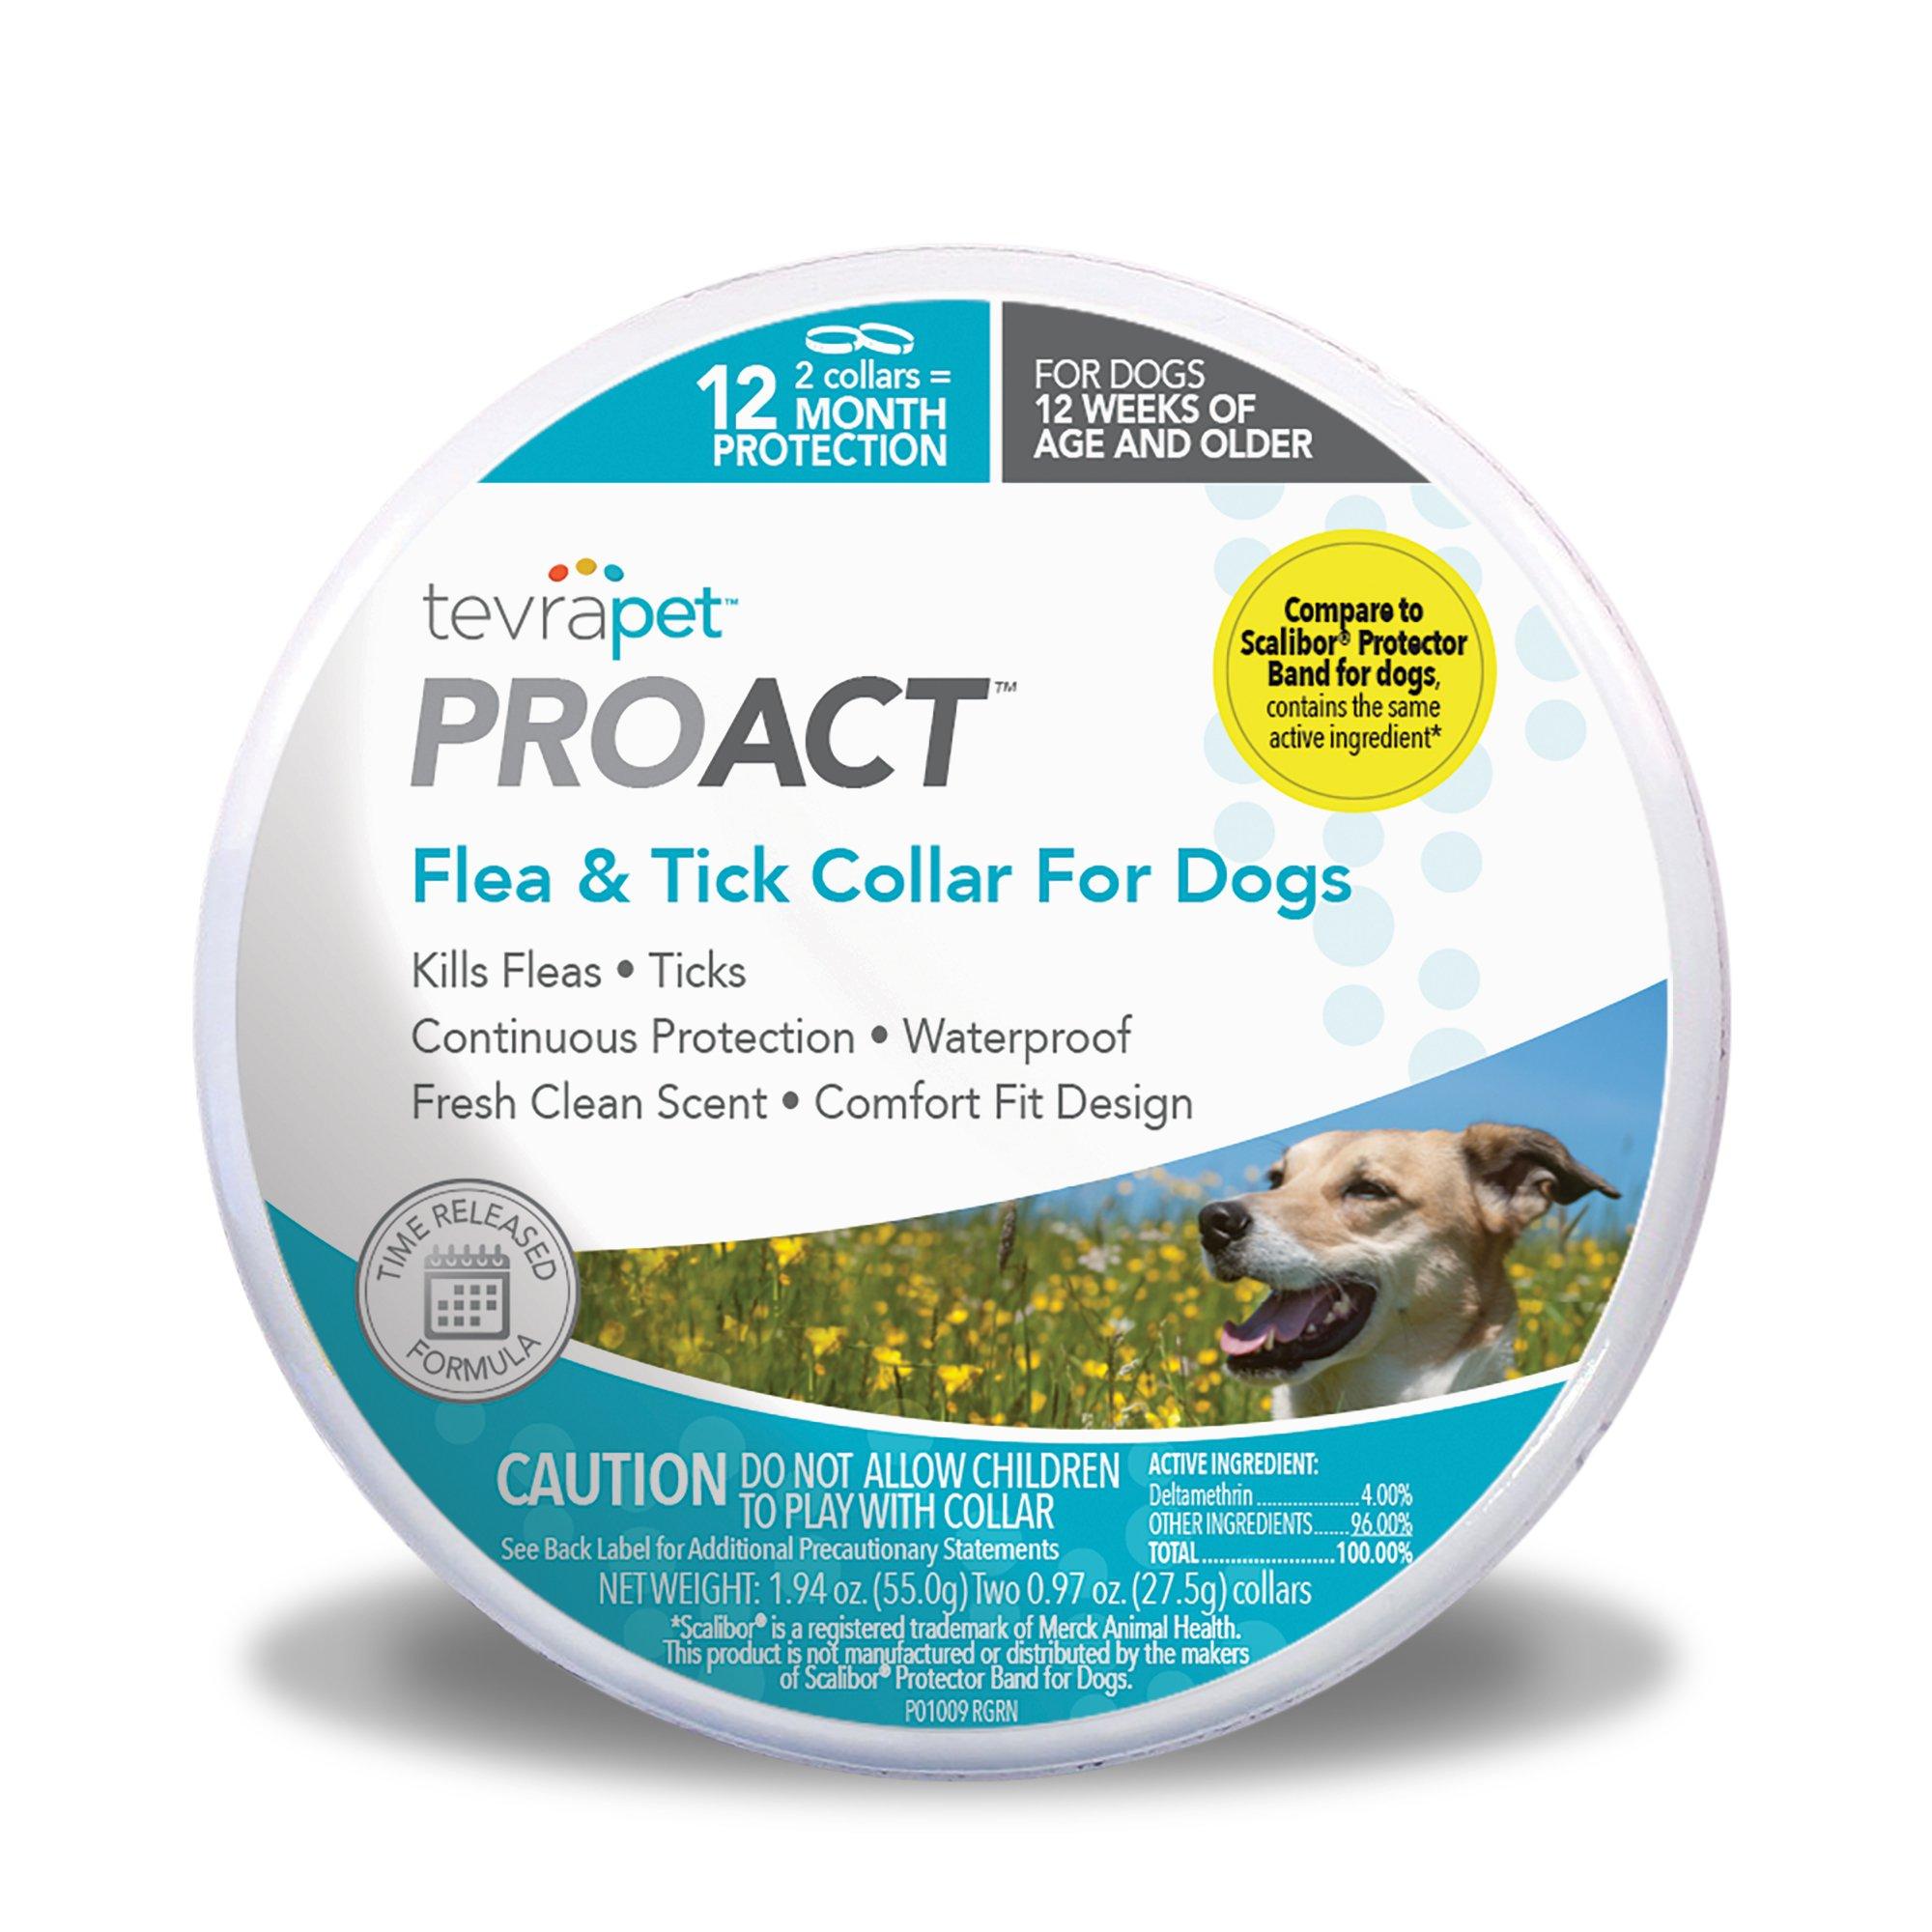 TevraPet ProAct Flea & Tick Collar for Dogs. 12 Months of Flea & Tick Protection. Waterproof Flea Collar for Dogs.